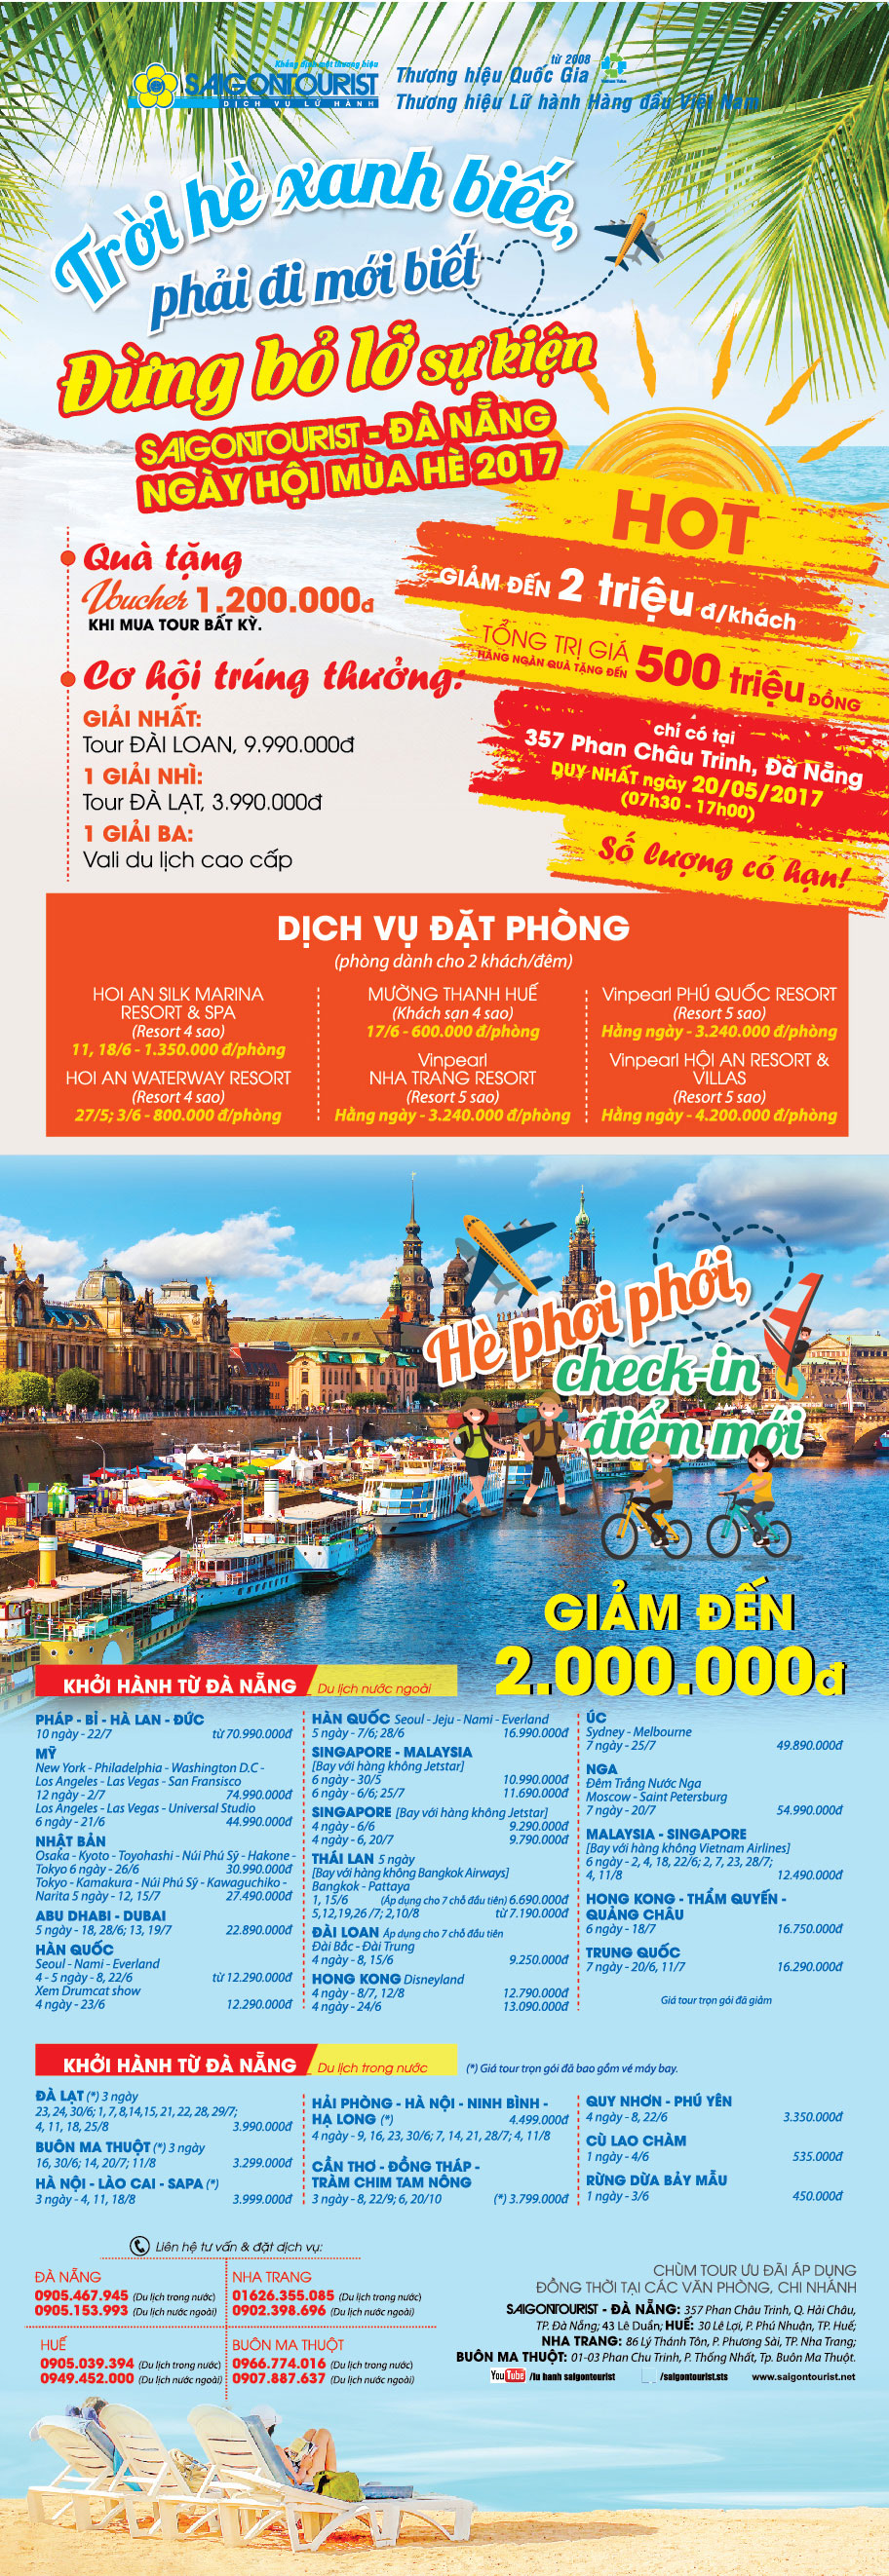 Ngày hội mùa Hè Saigontourist 2017